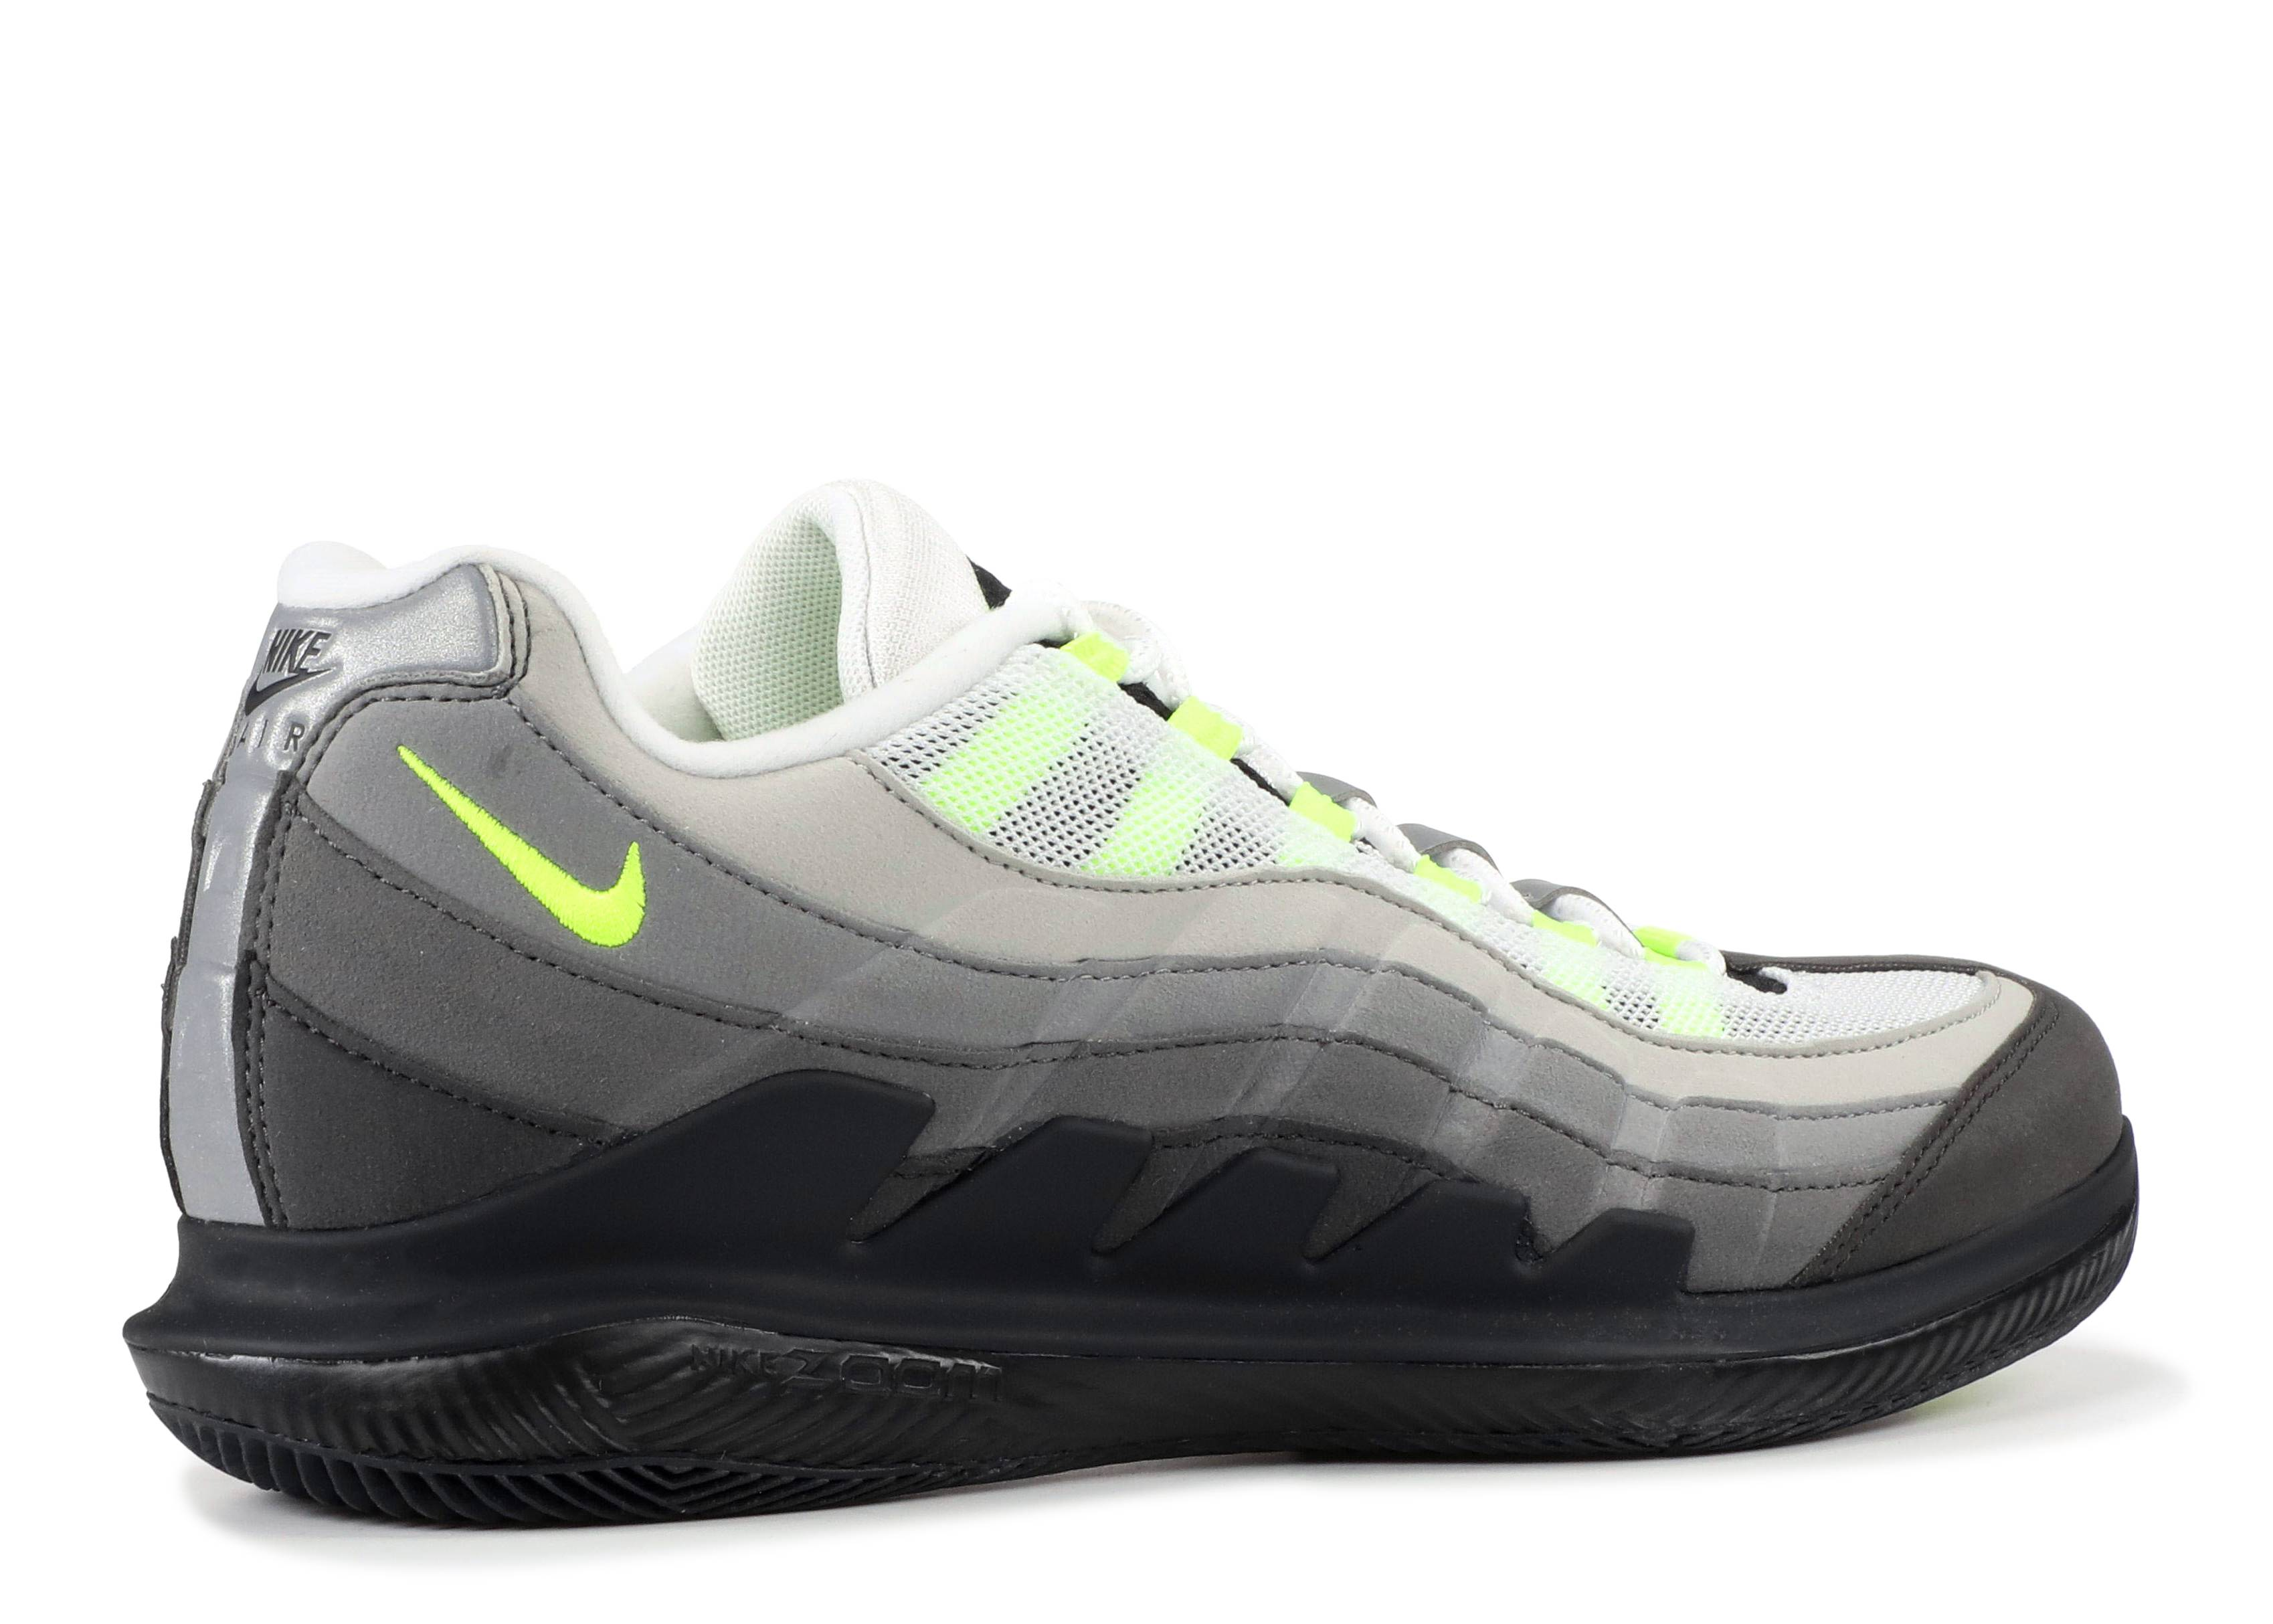 f695e9e541a9 Nike Zoom Vapor RF X AM 95 - Nike - ao8759 078 - black volt-medium ash